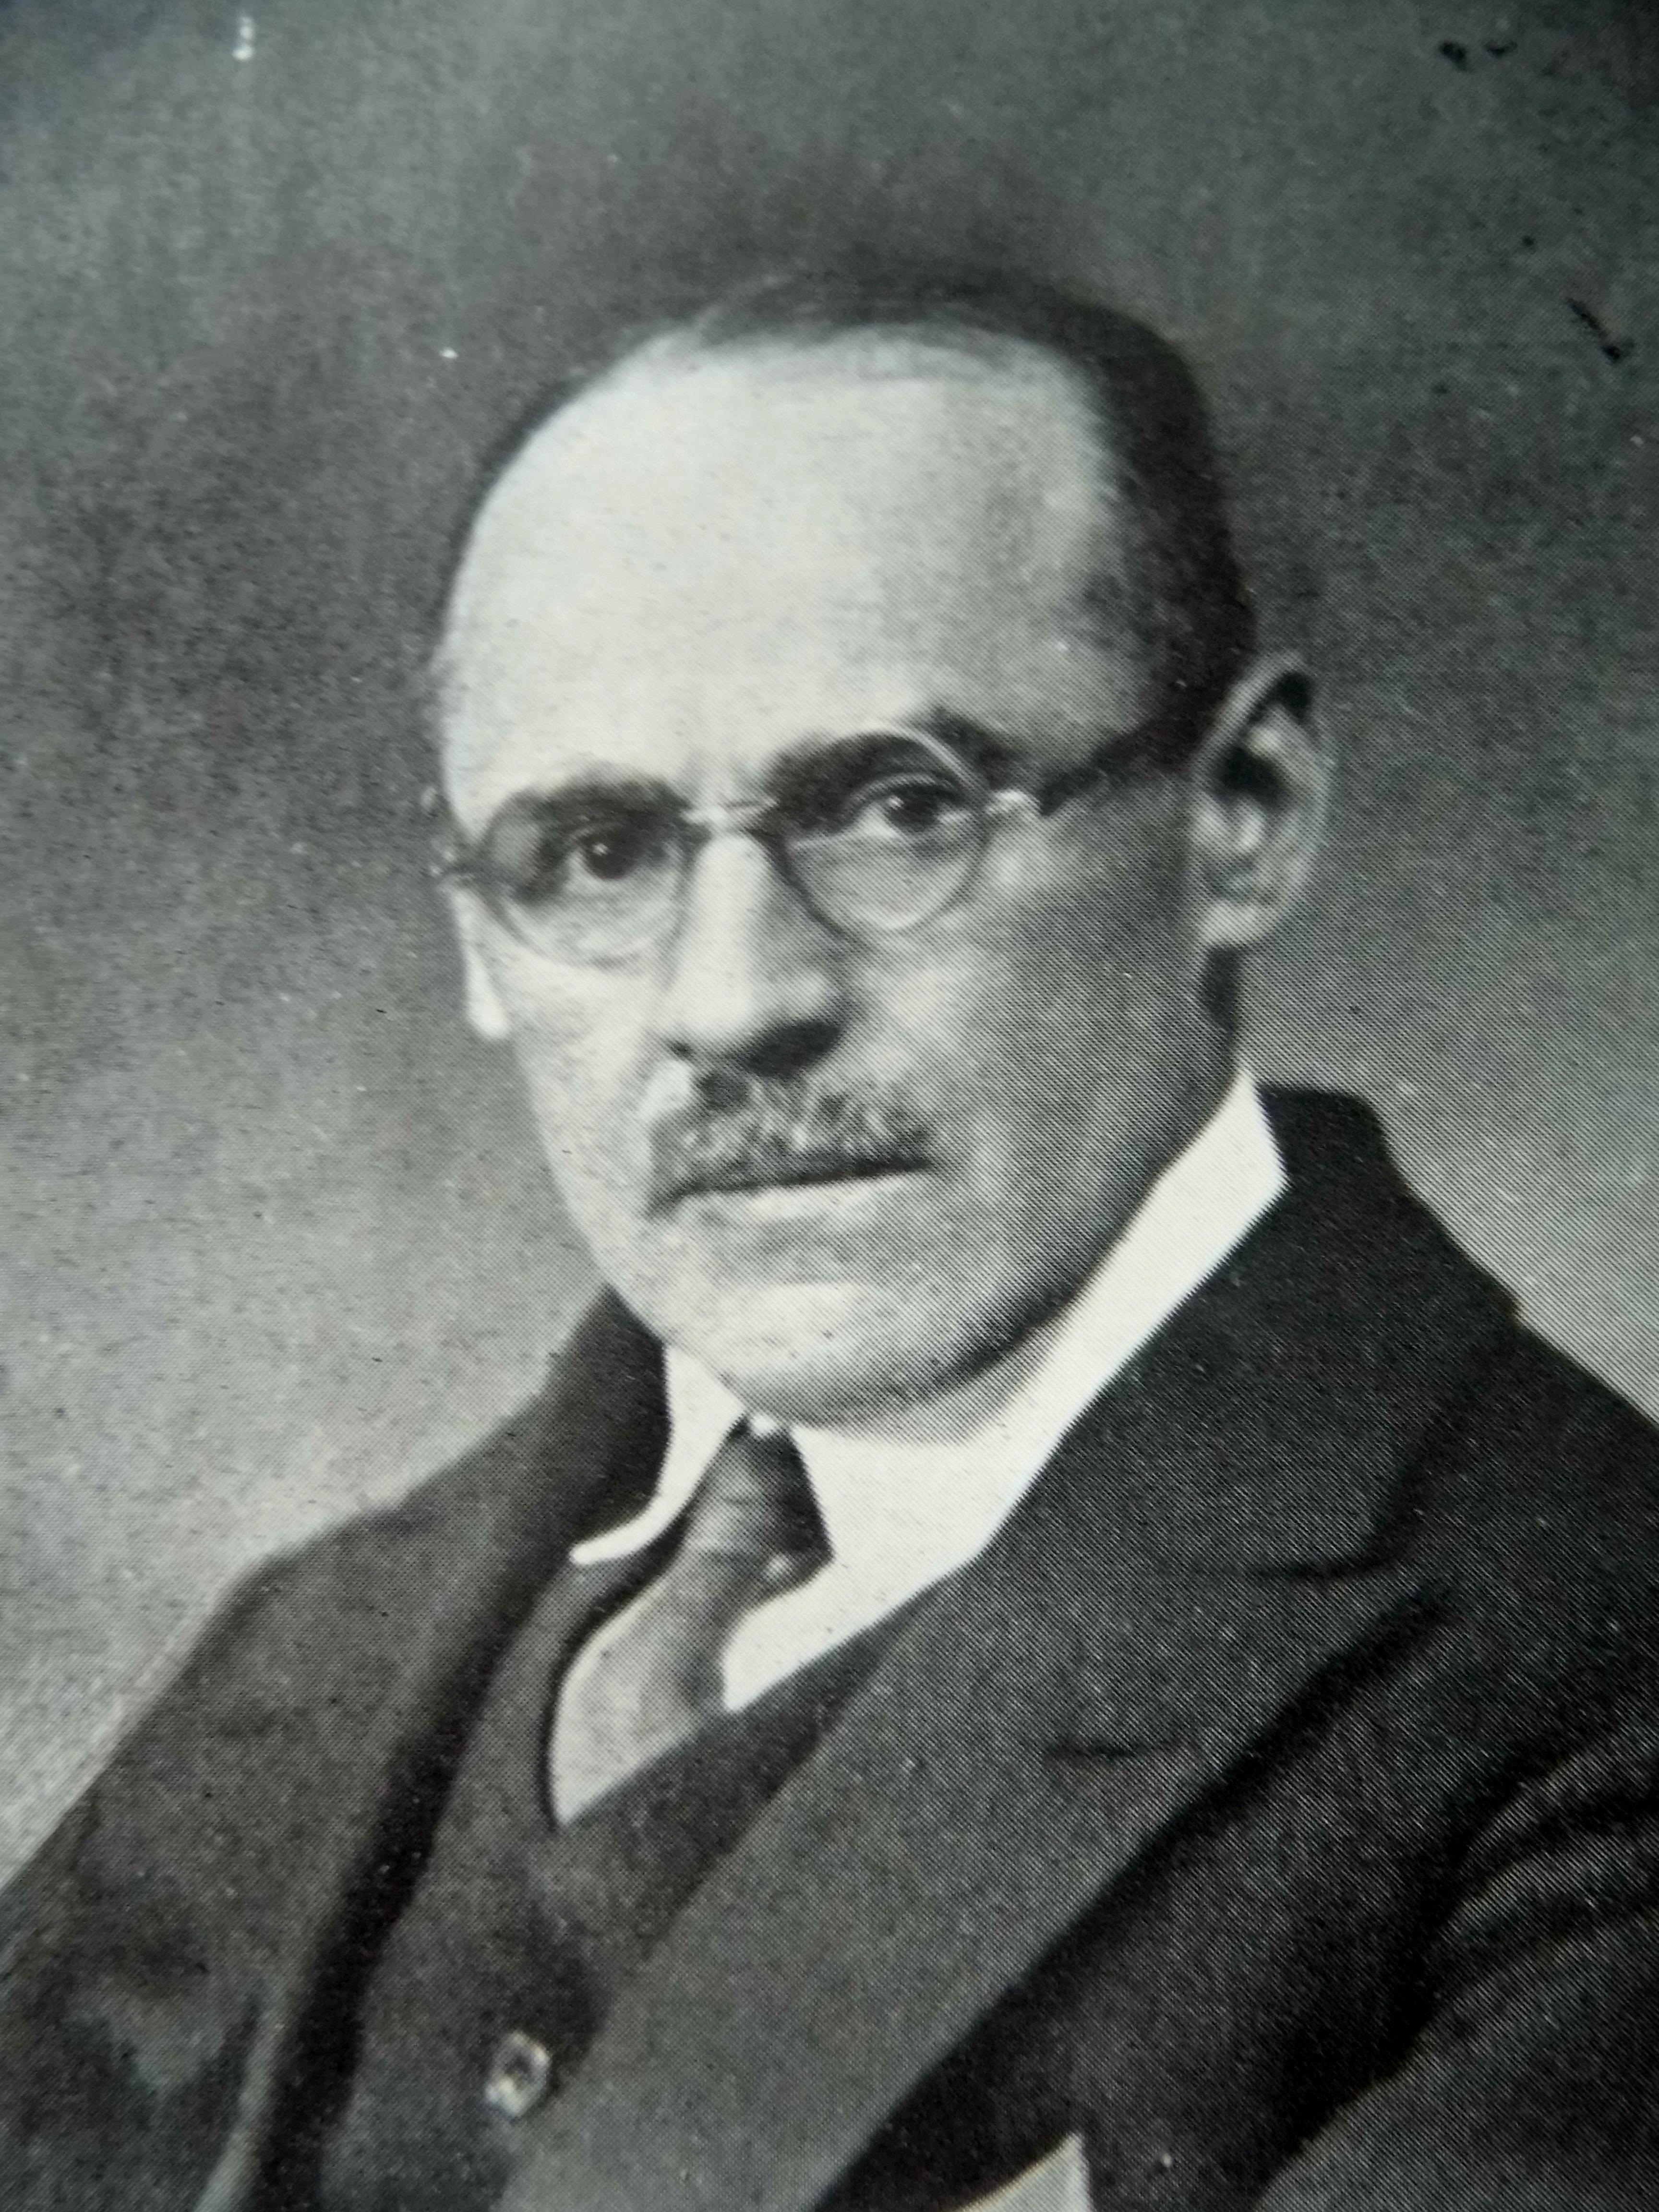 image of Joseph Malègue